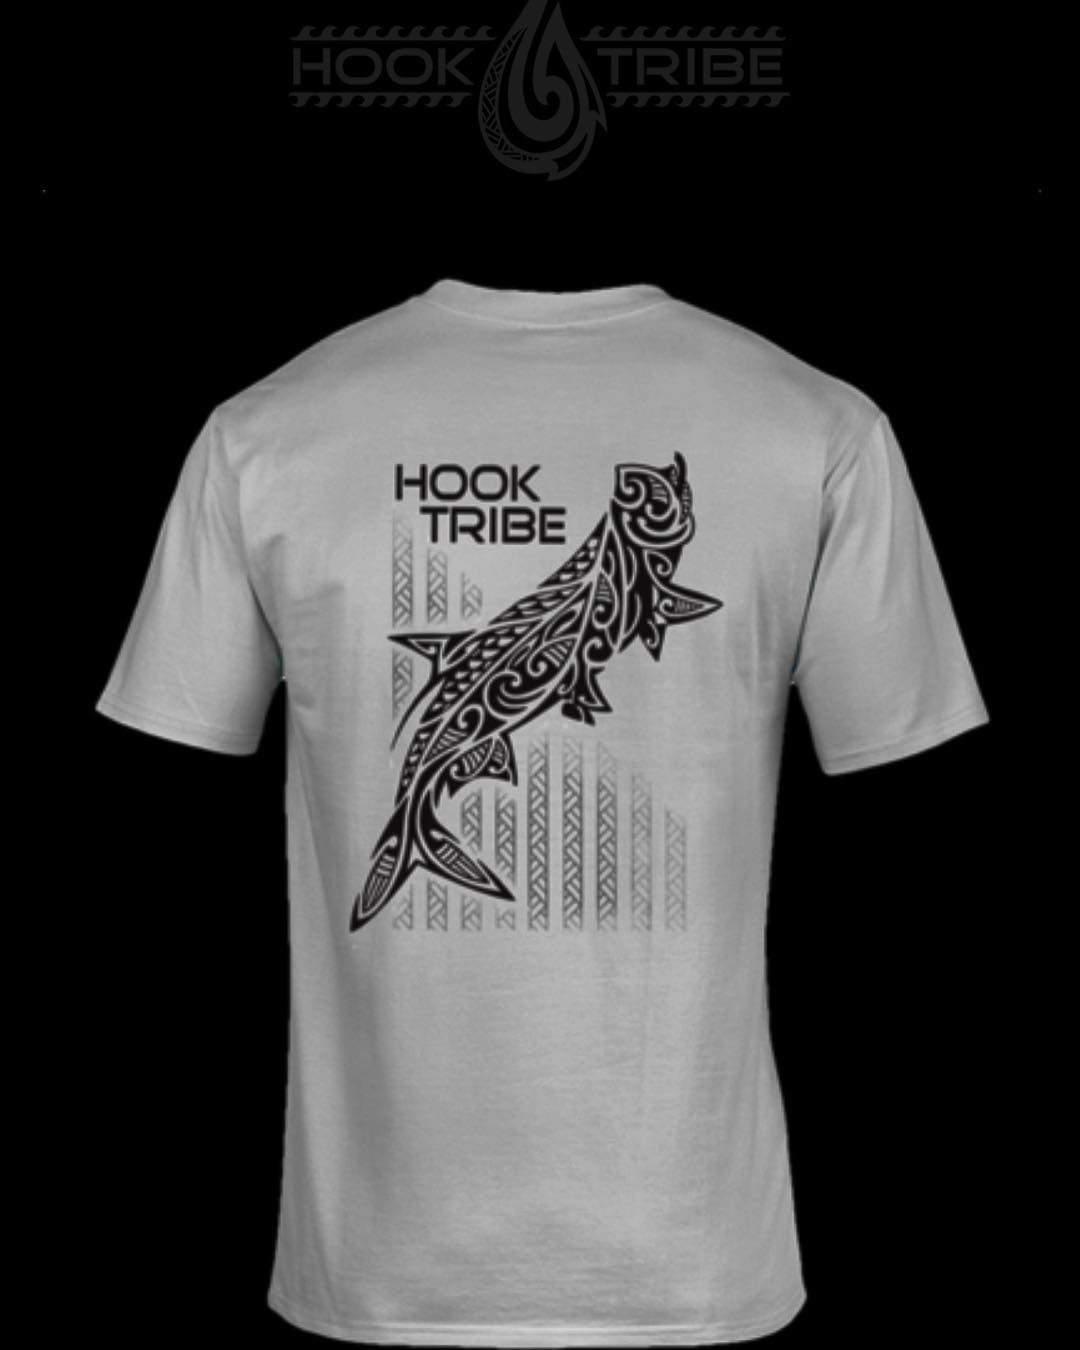 @hook.tribe